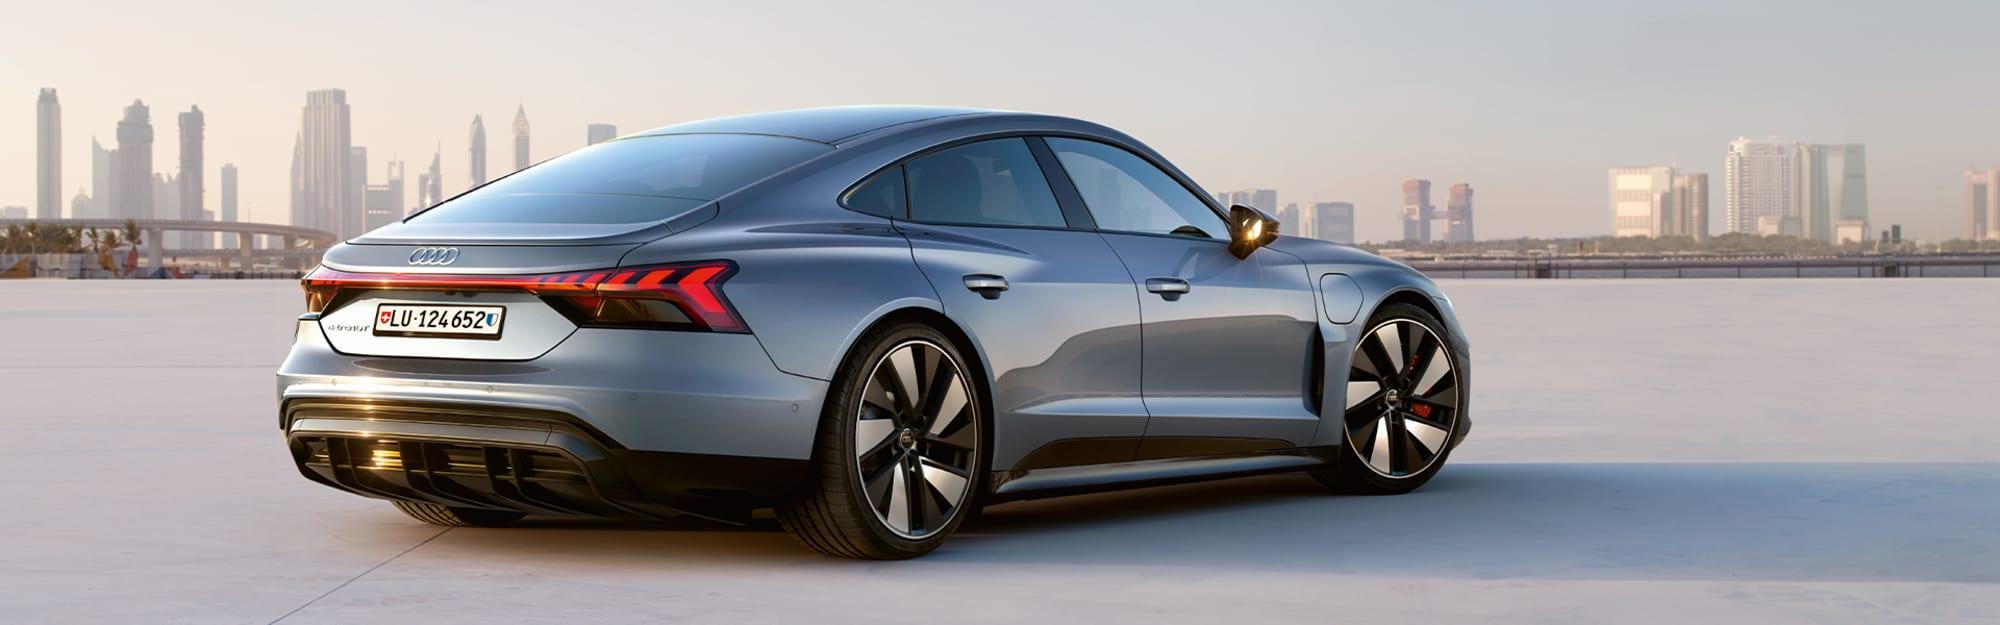 Audi_etronGT_Haendlerwebseite_1920x600px_d